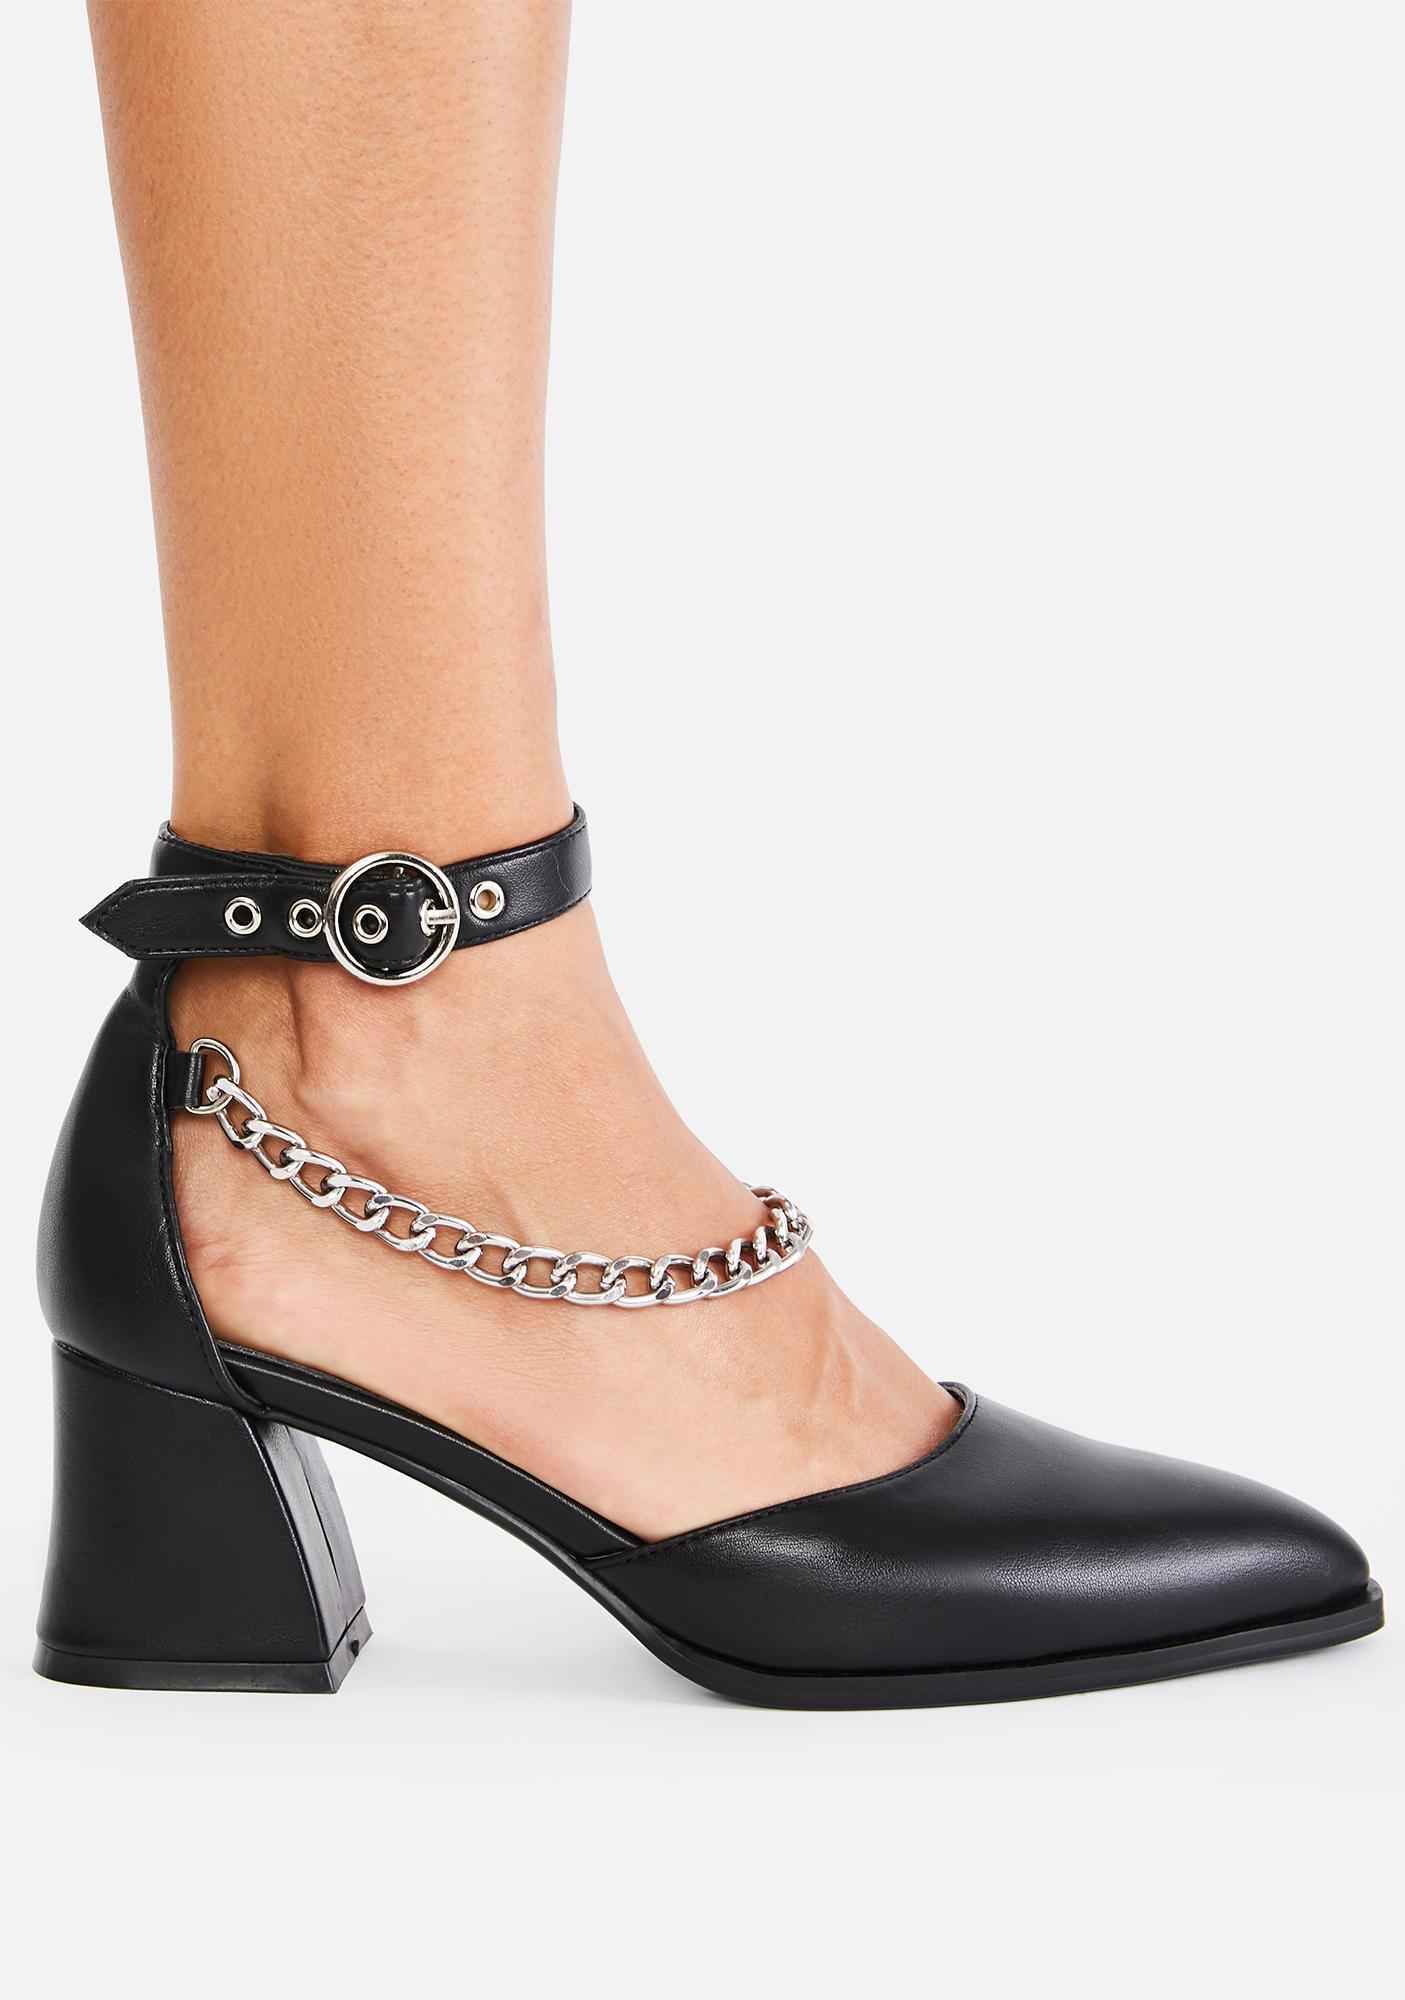 Lamoda Classy N' Sassy Chain Heels